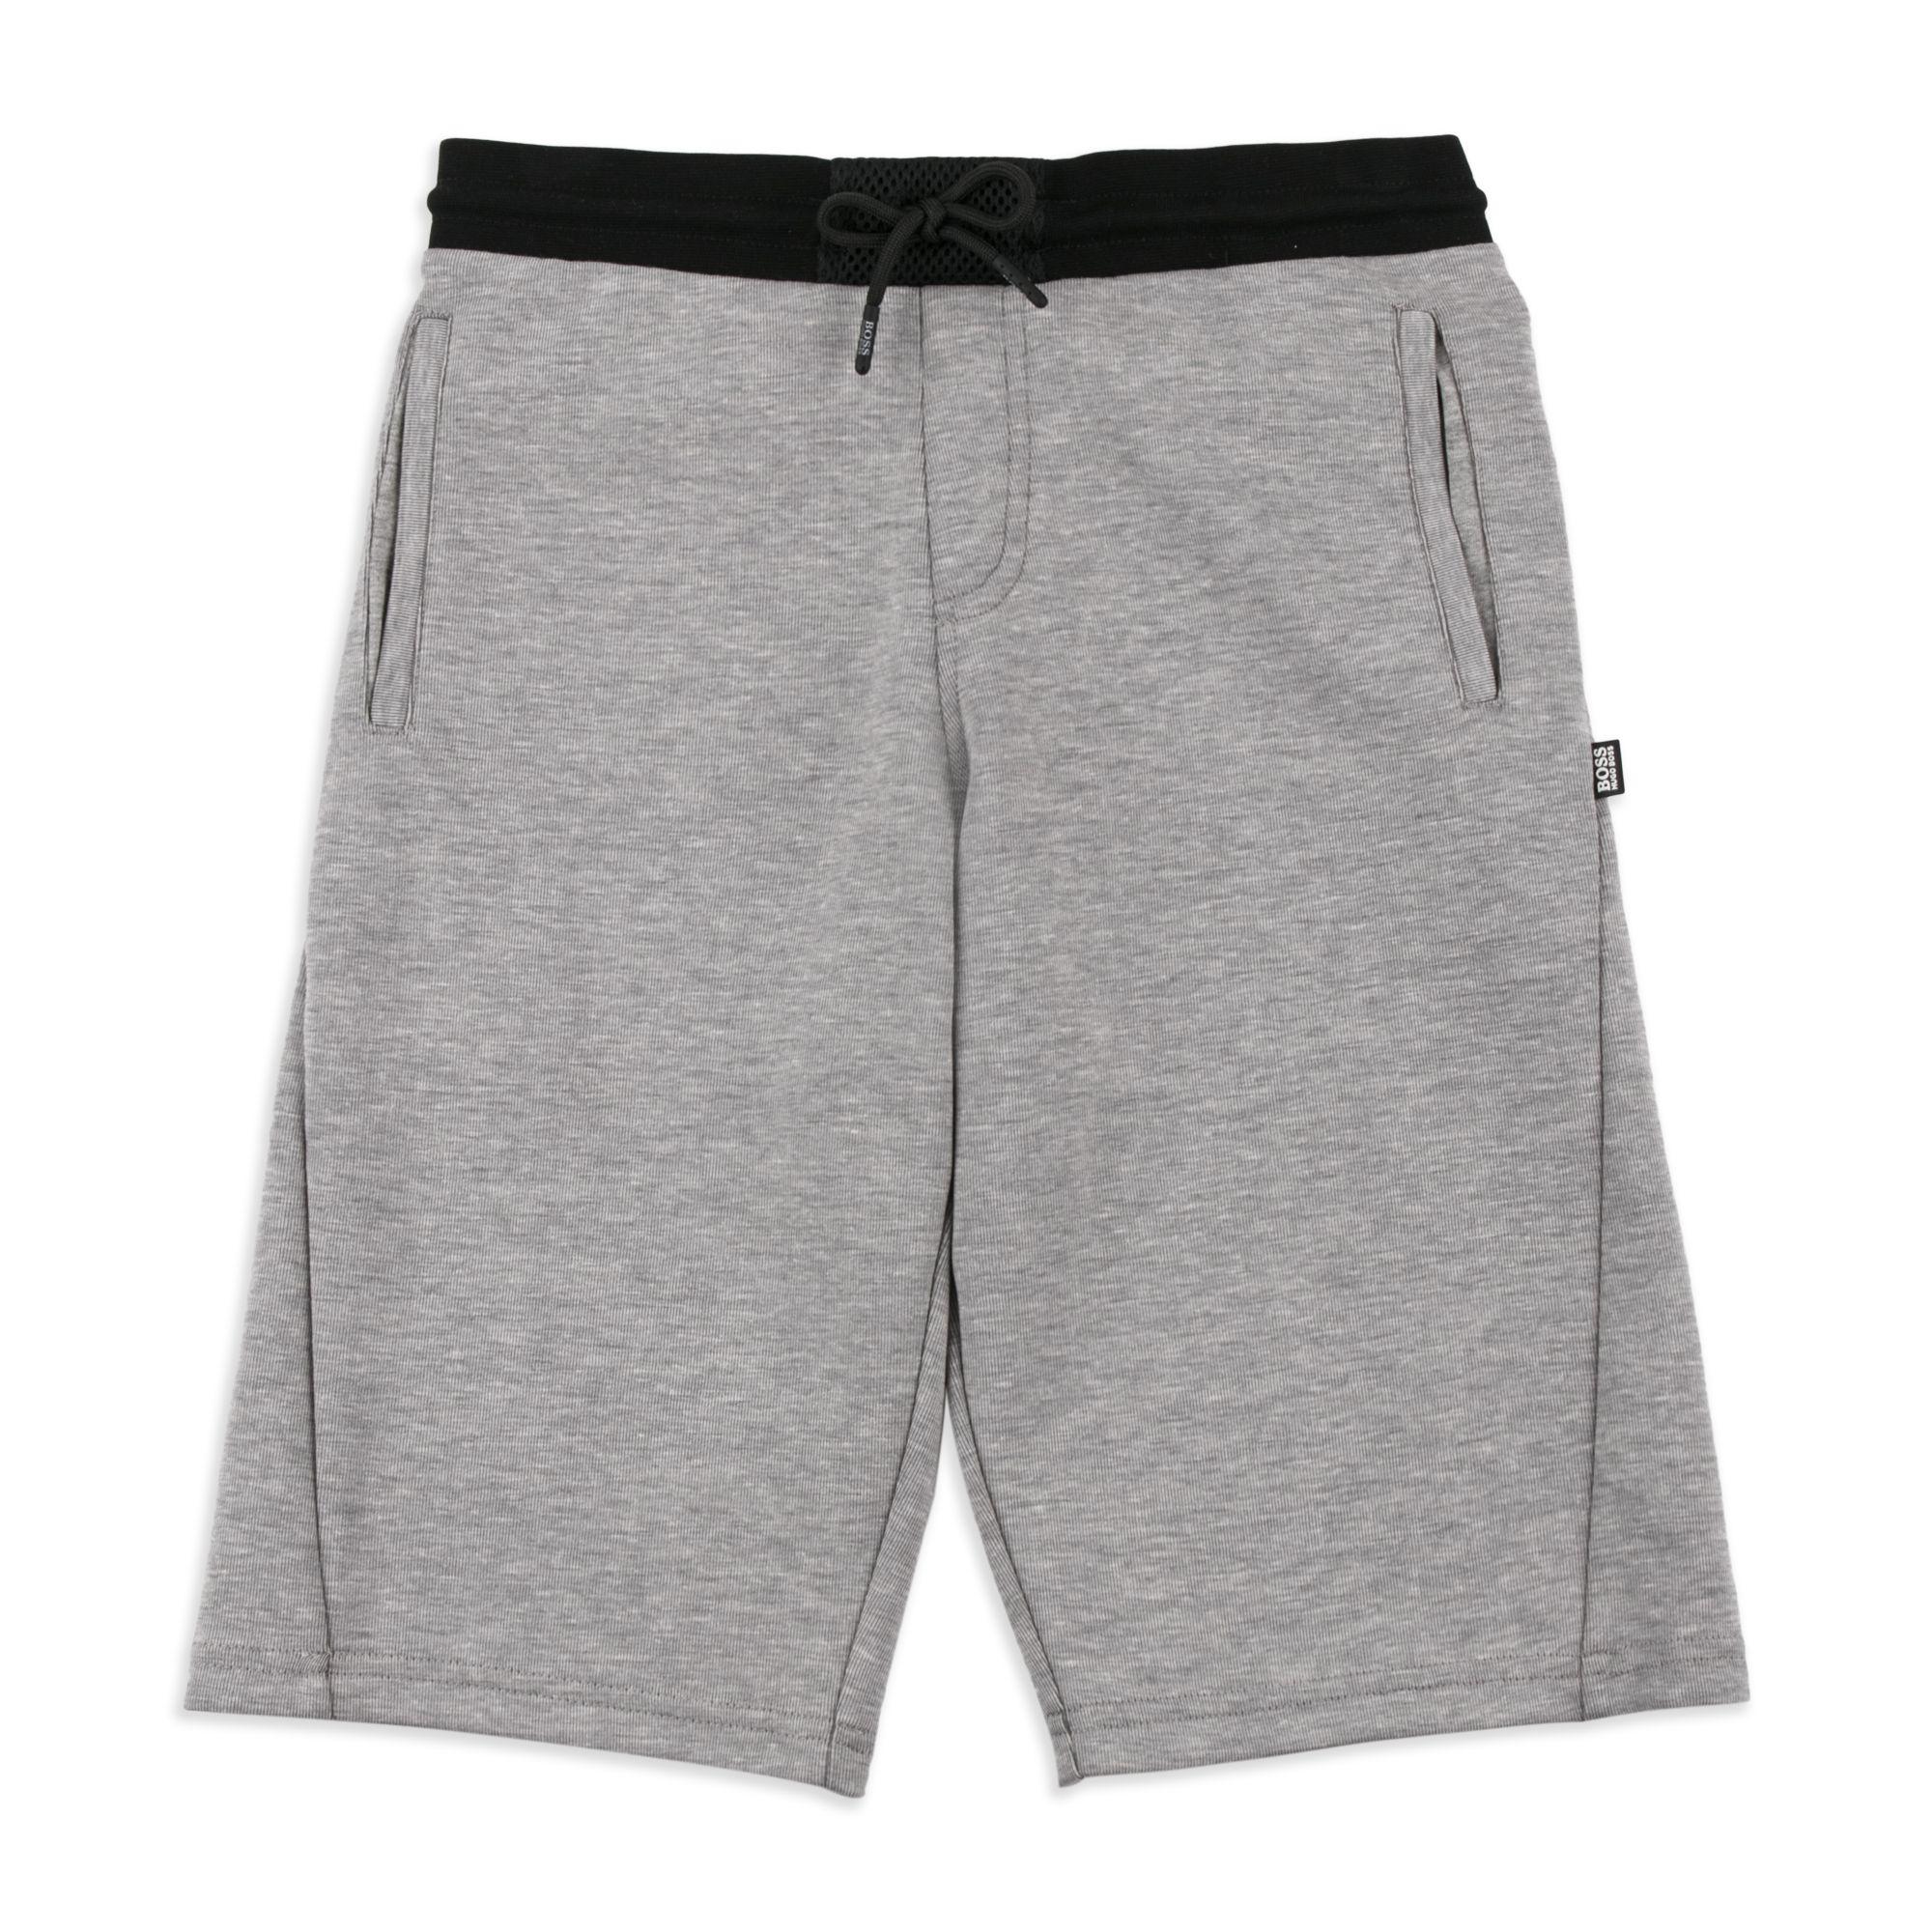 3fda576e4d73 BOSS KIDS Boys Mesh Panel Sweat Shorts - Grey Boys sweat shorts •  Lightweight cotton blend • Elasticated waist • Drawstring ties • Three  pocket design ...